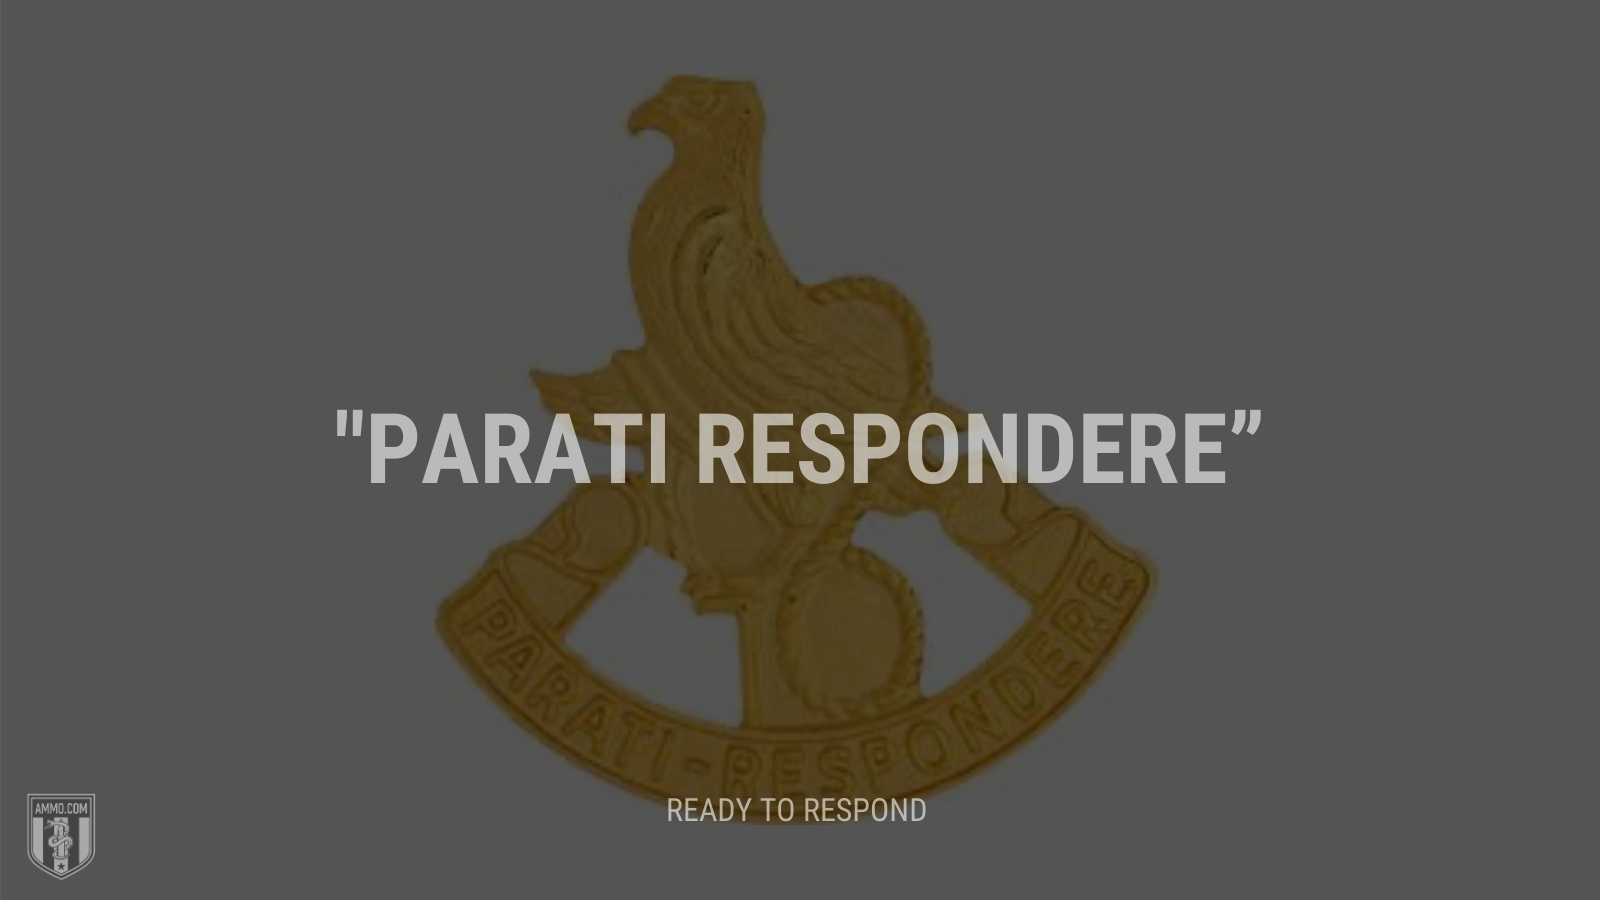 """Parati respondere"" - Ready to respond"